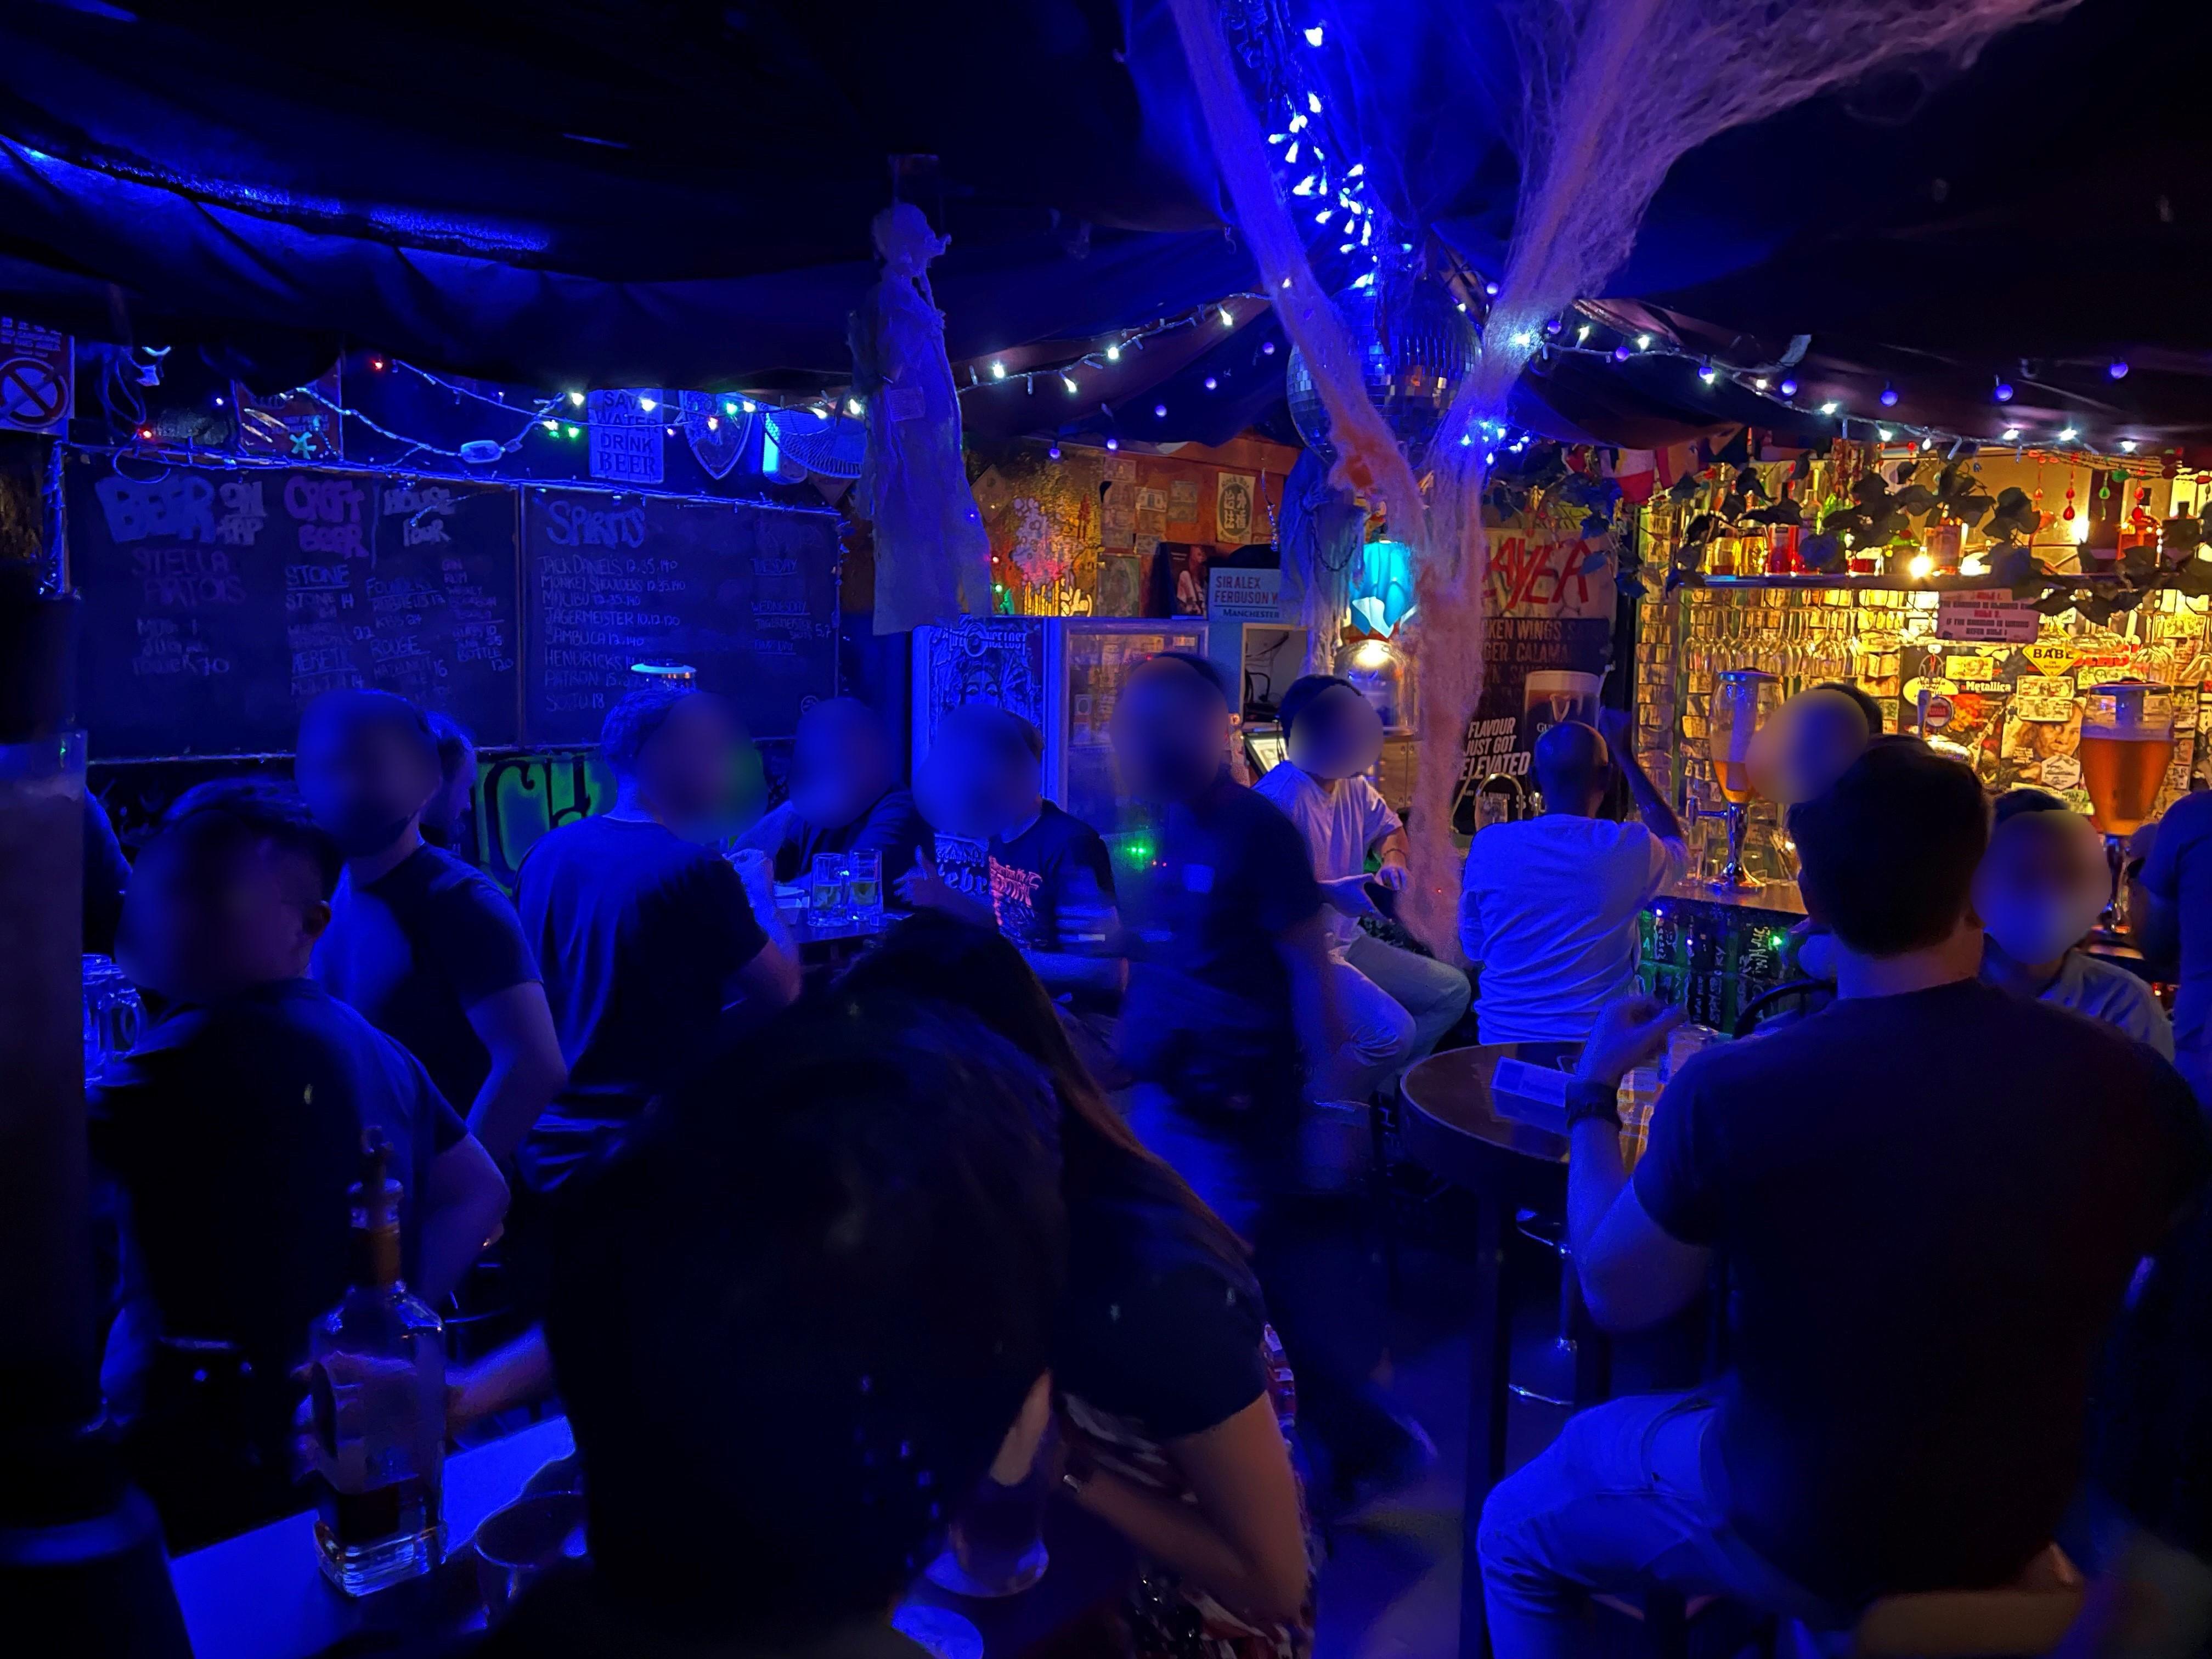 Chips Café and Bar